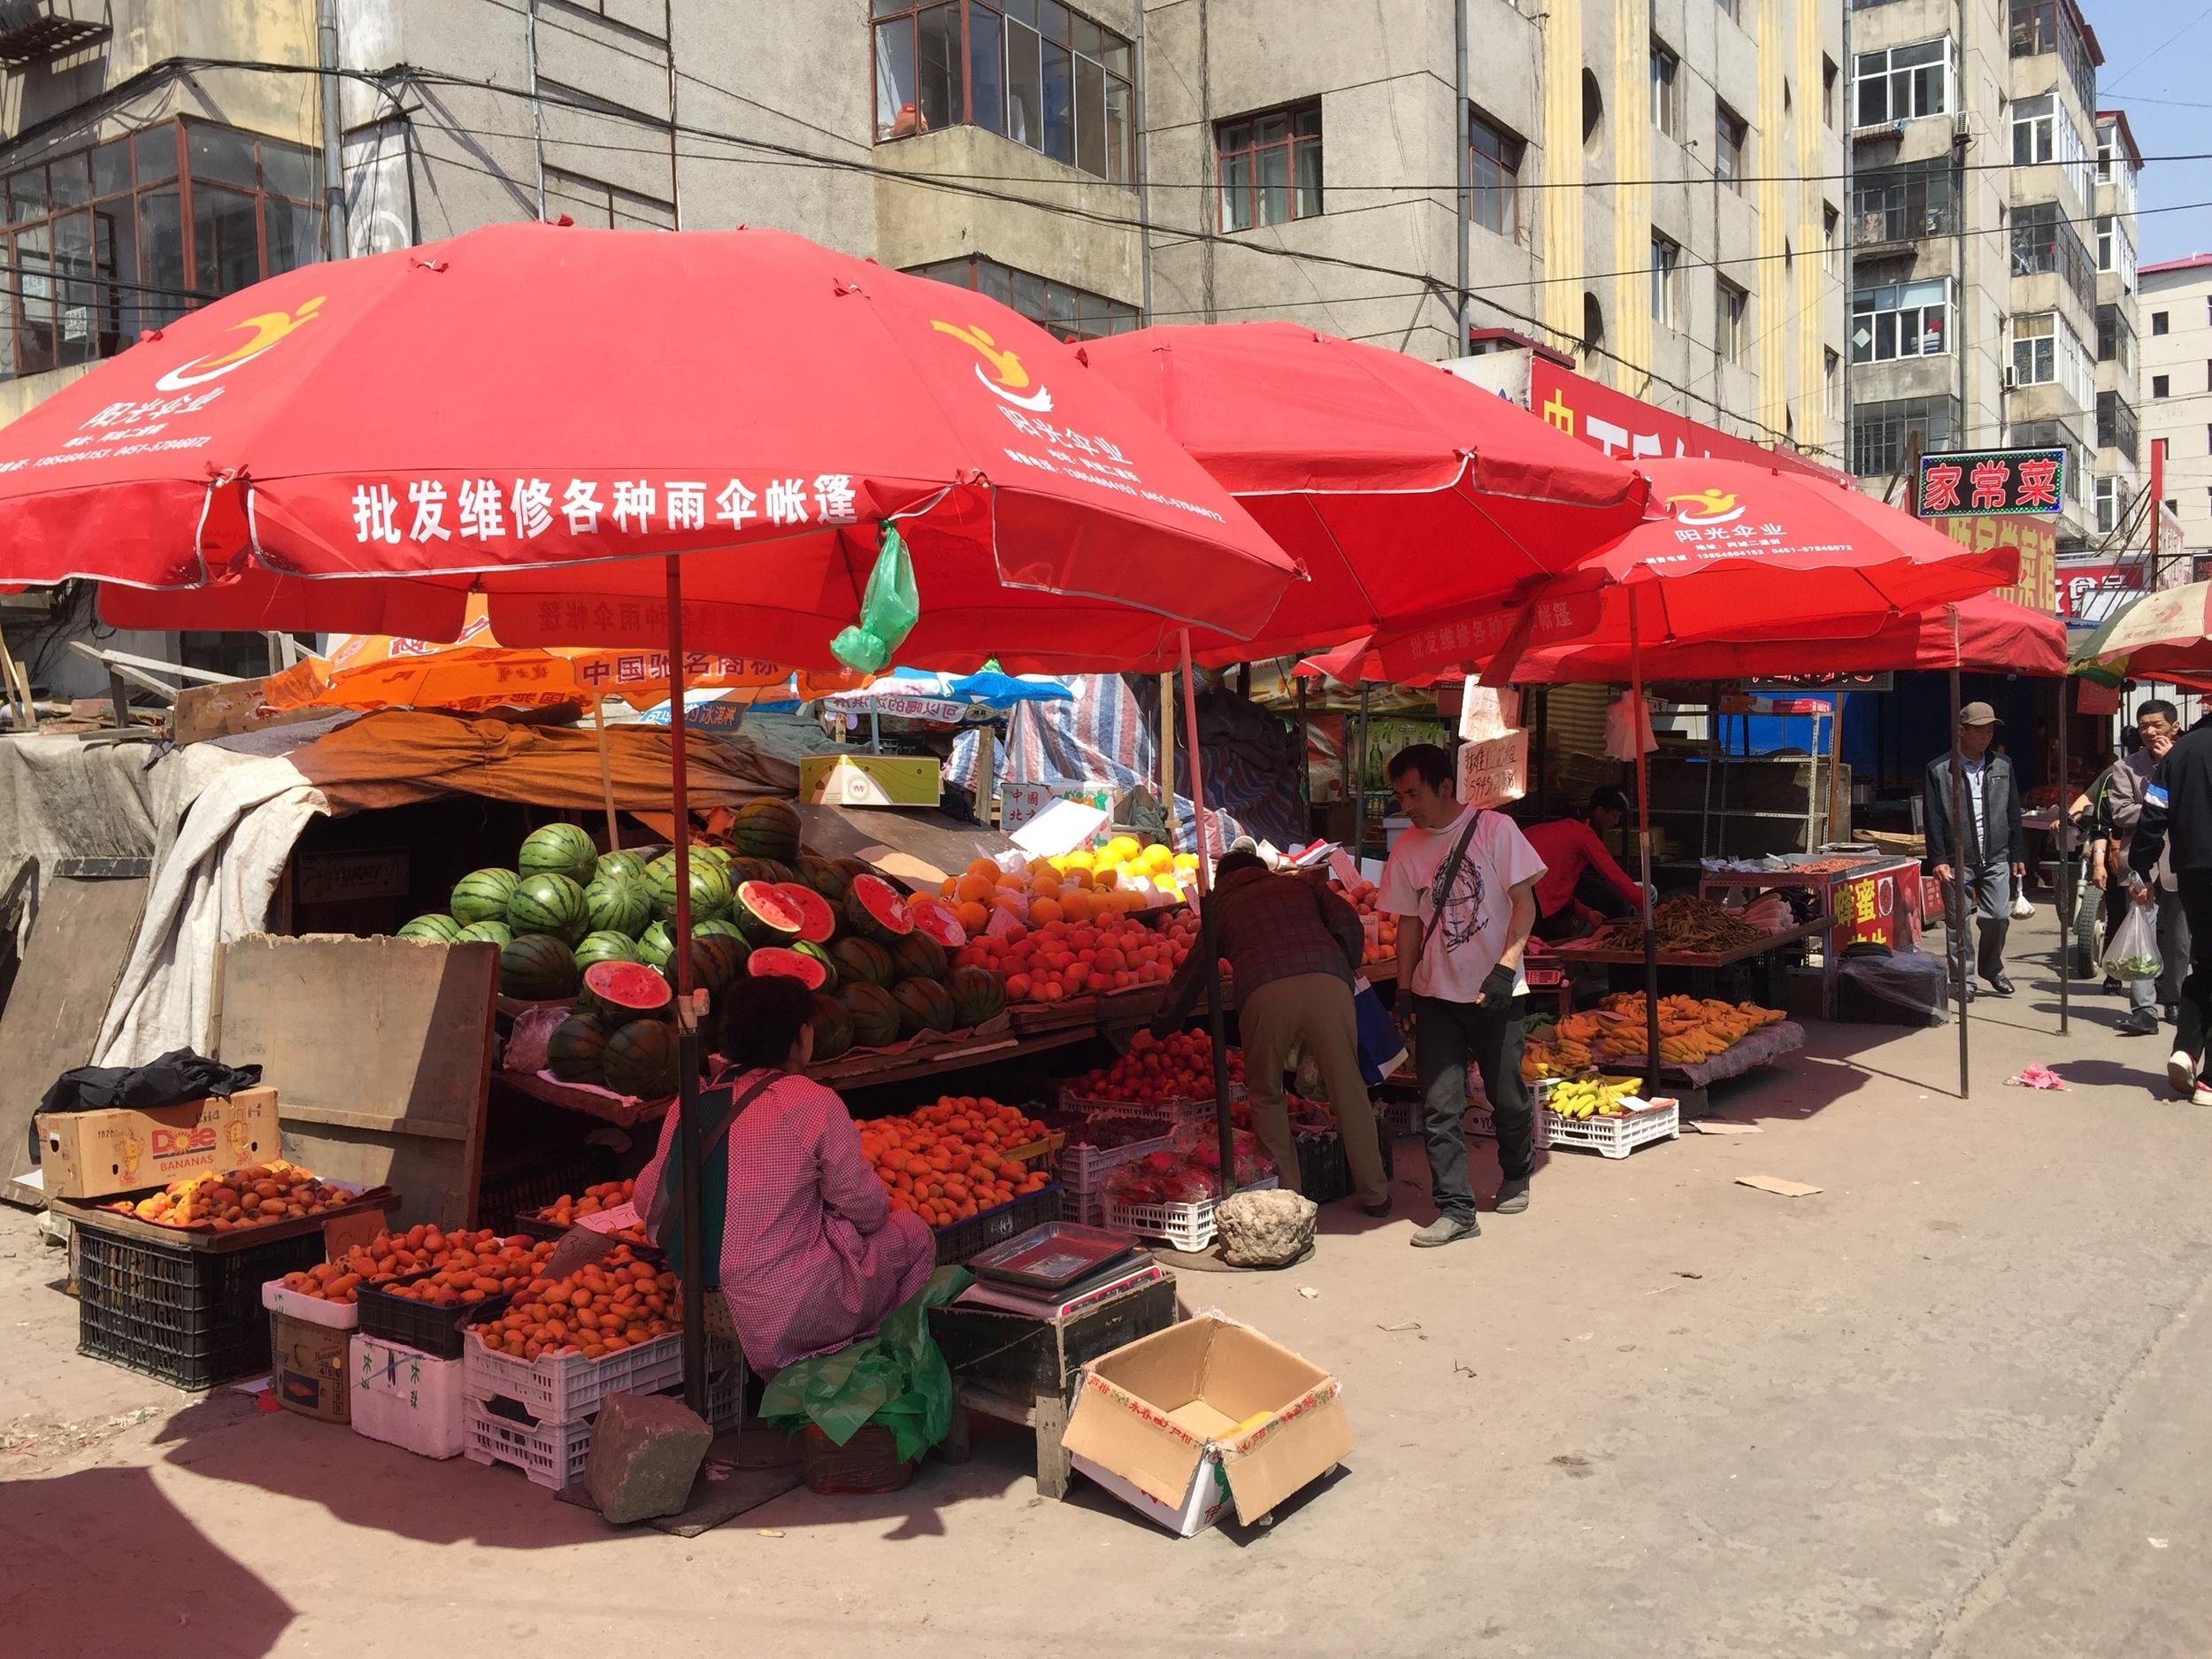 Chinese street market